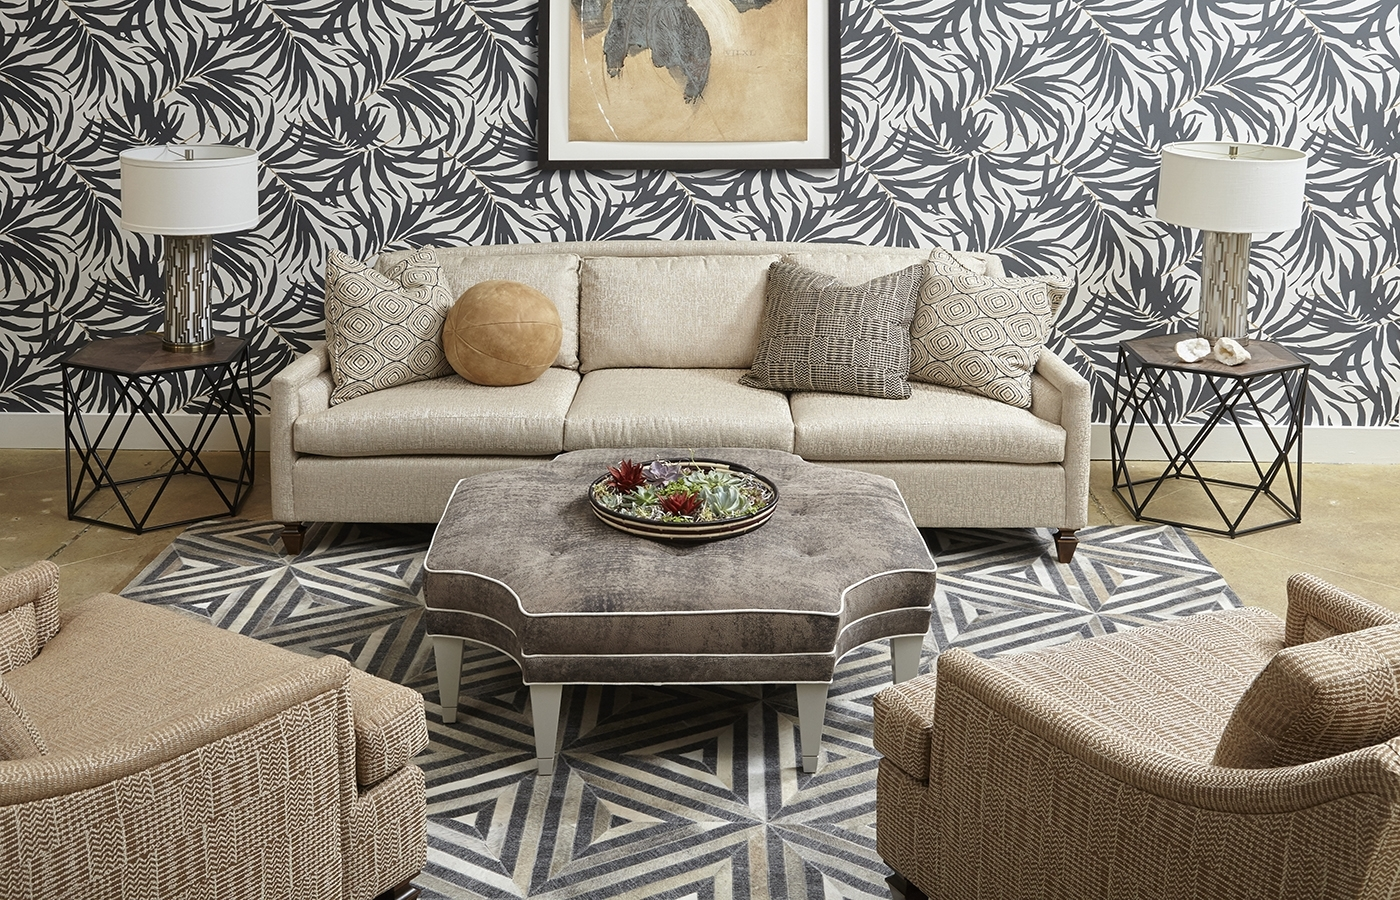 Norwalk Furniture In Norwalk Sofas (View 3 of 10)